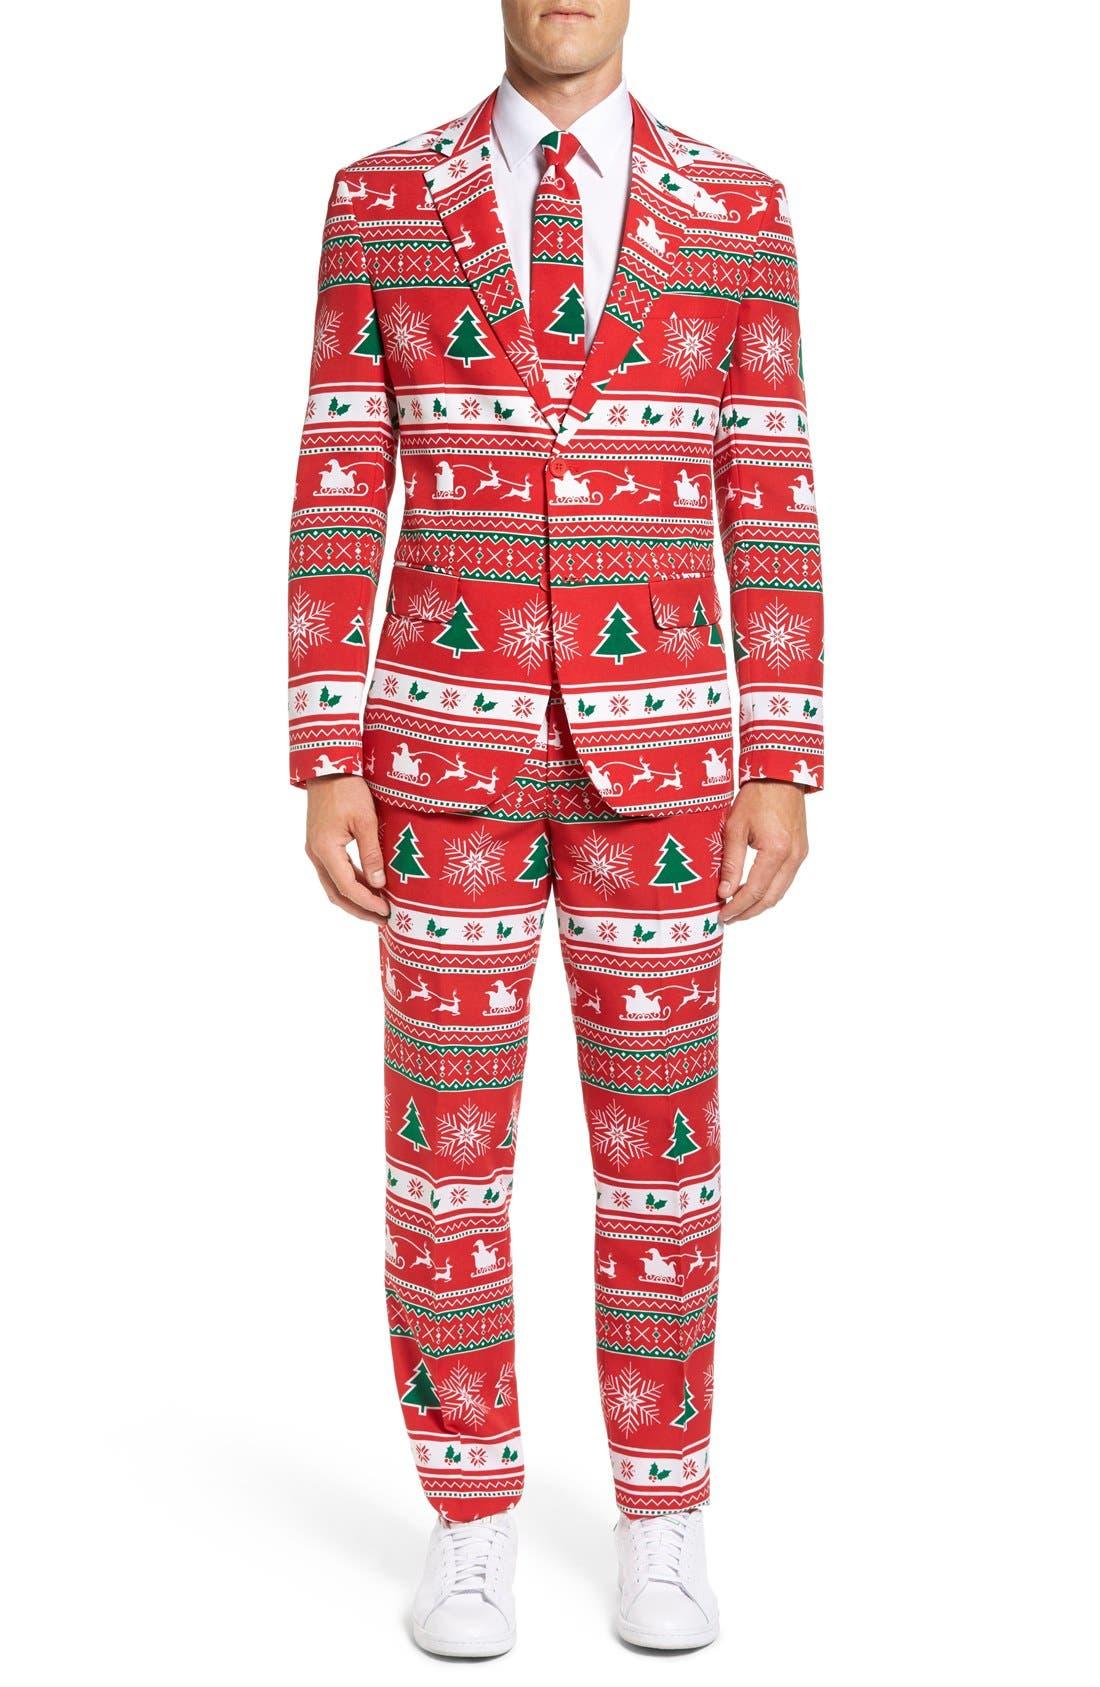 'Winter Wonderland' Trim Fit Two-Piece Suit with Tie,                         Main,                         color, 601